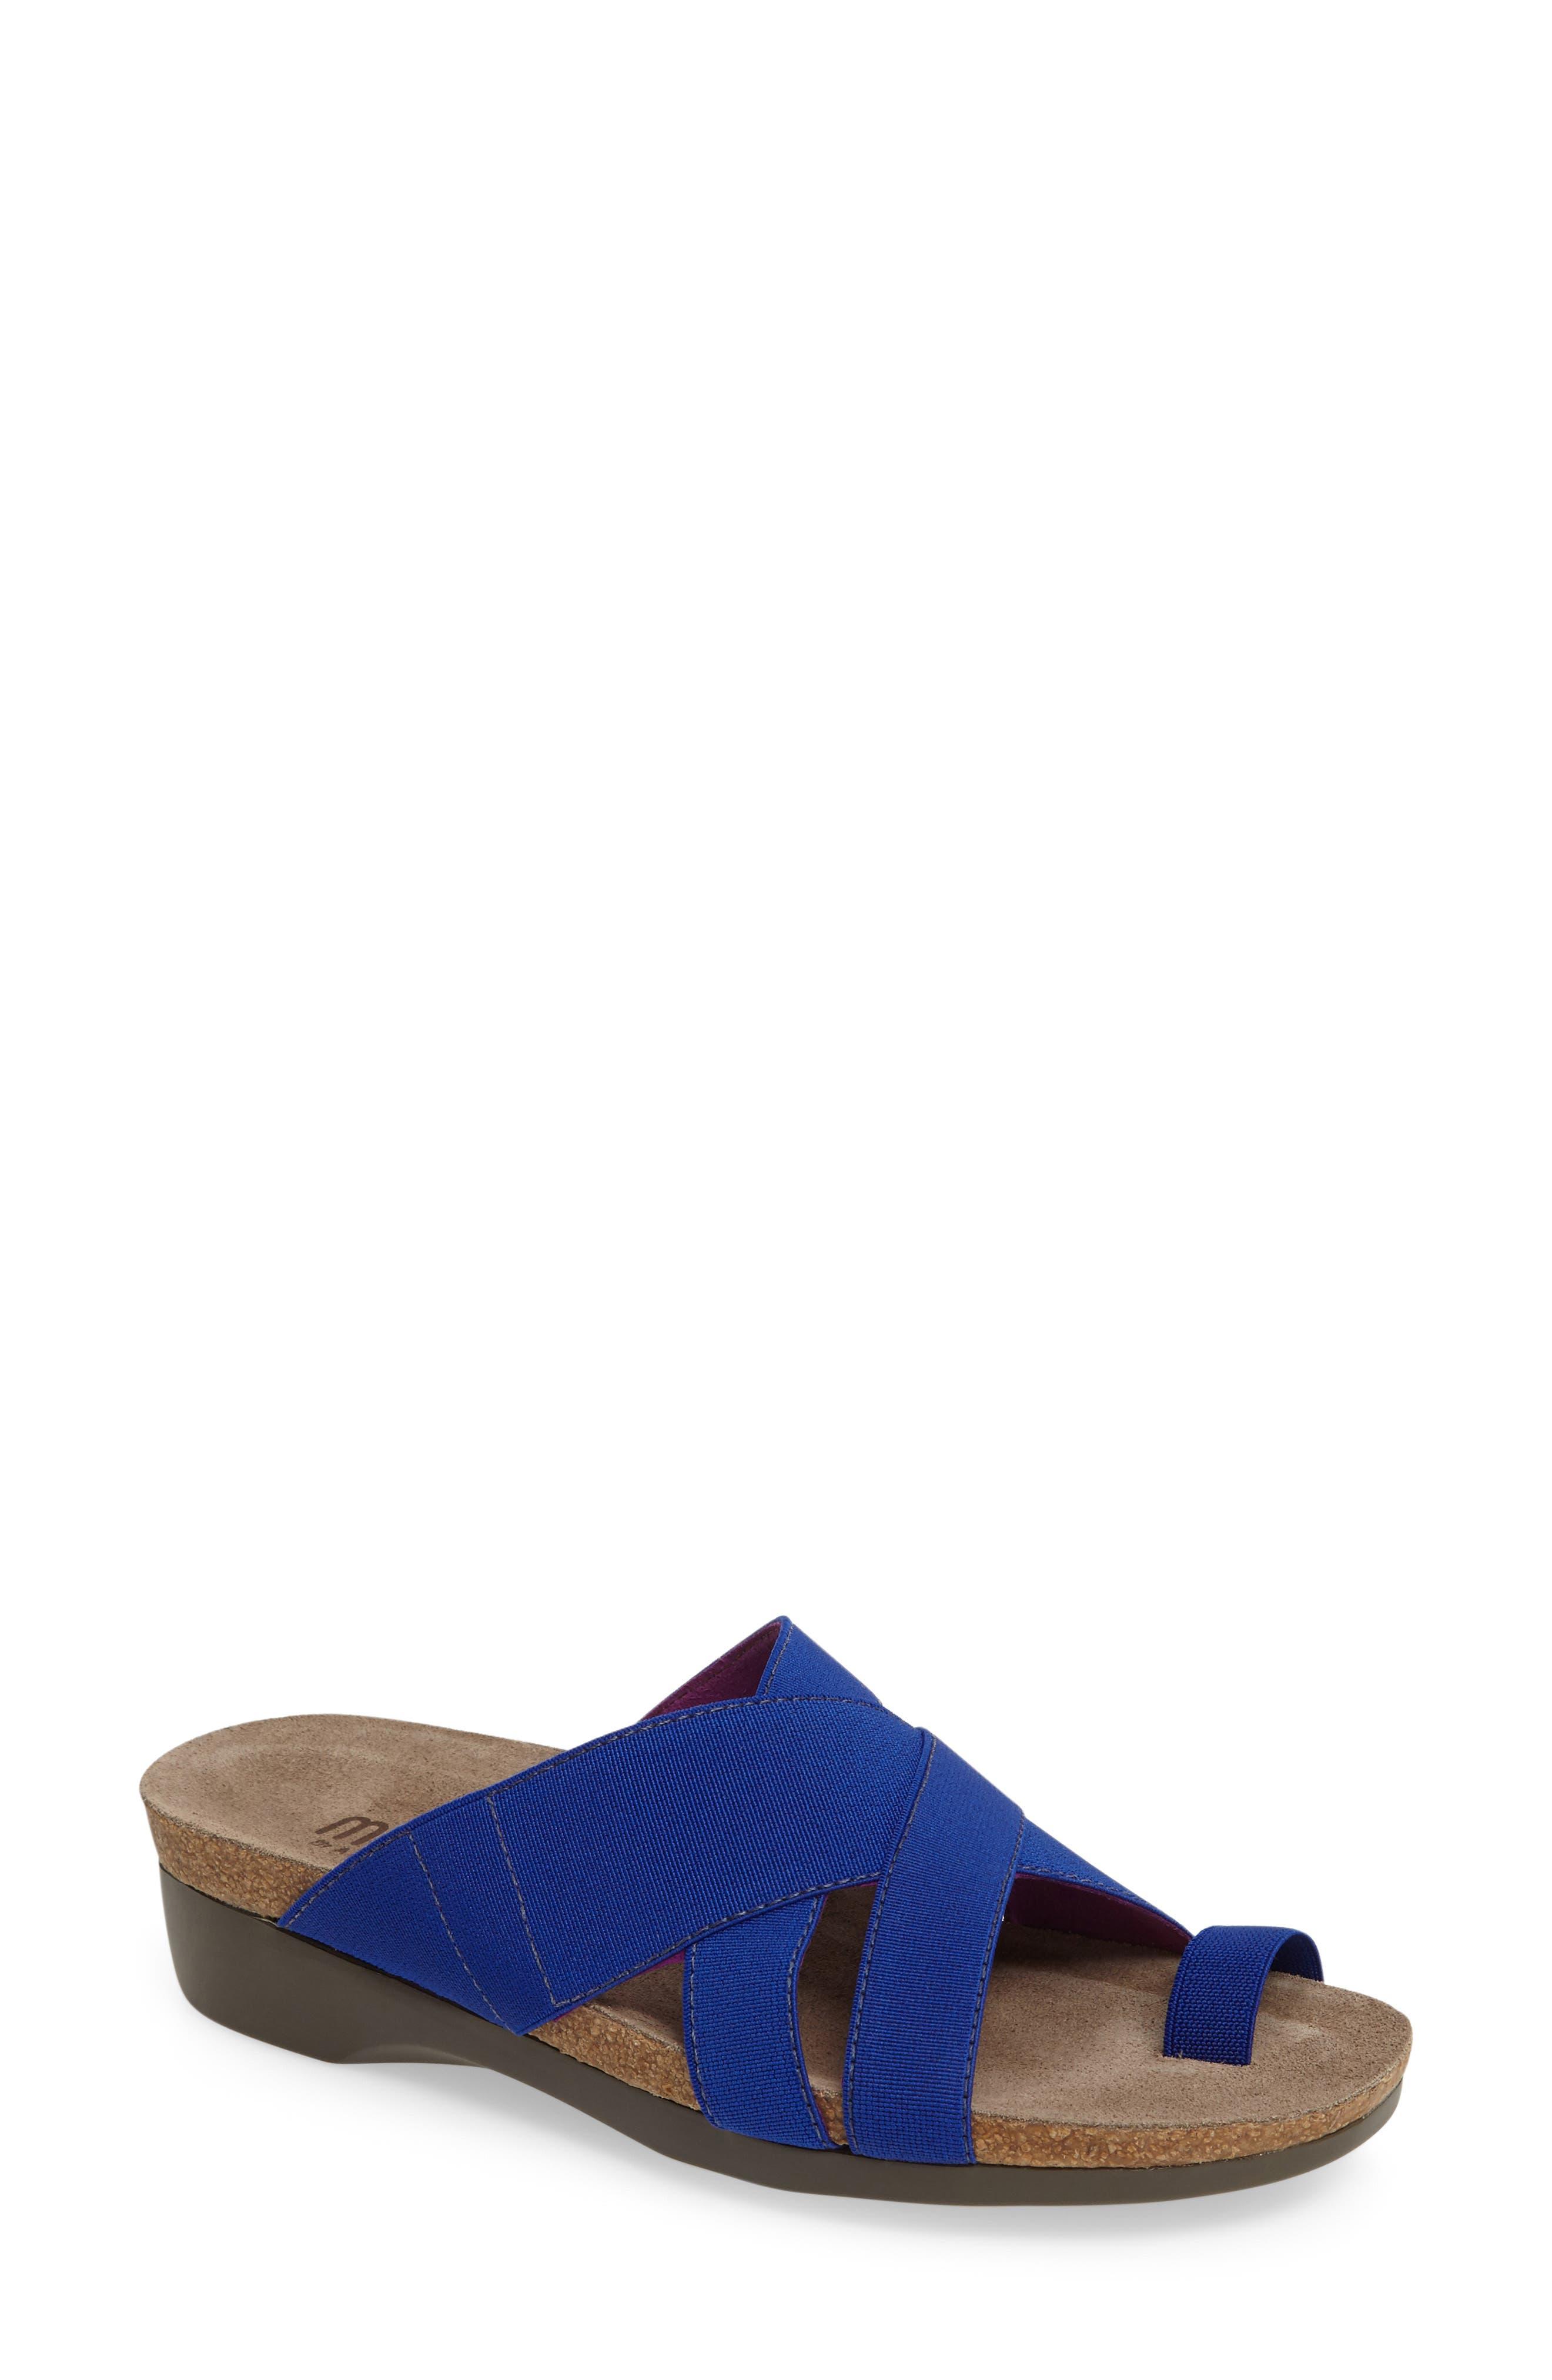 Delphi Slide Sandal,                         Main,                         color, Blue Fabric